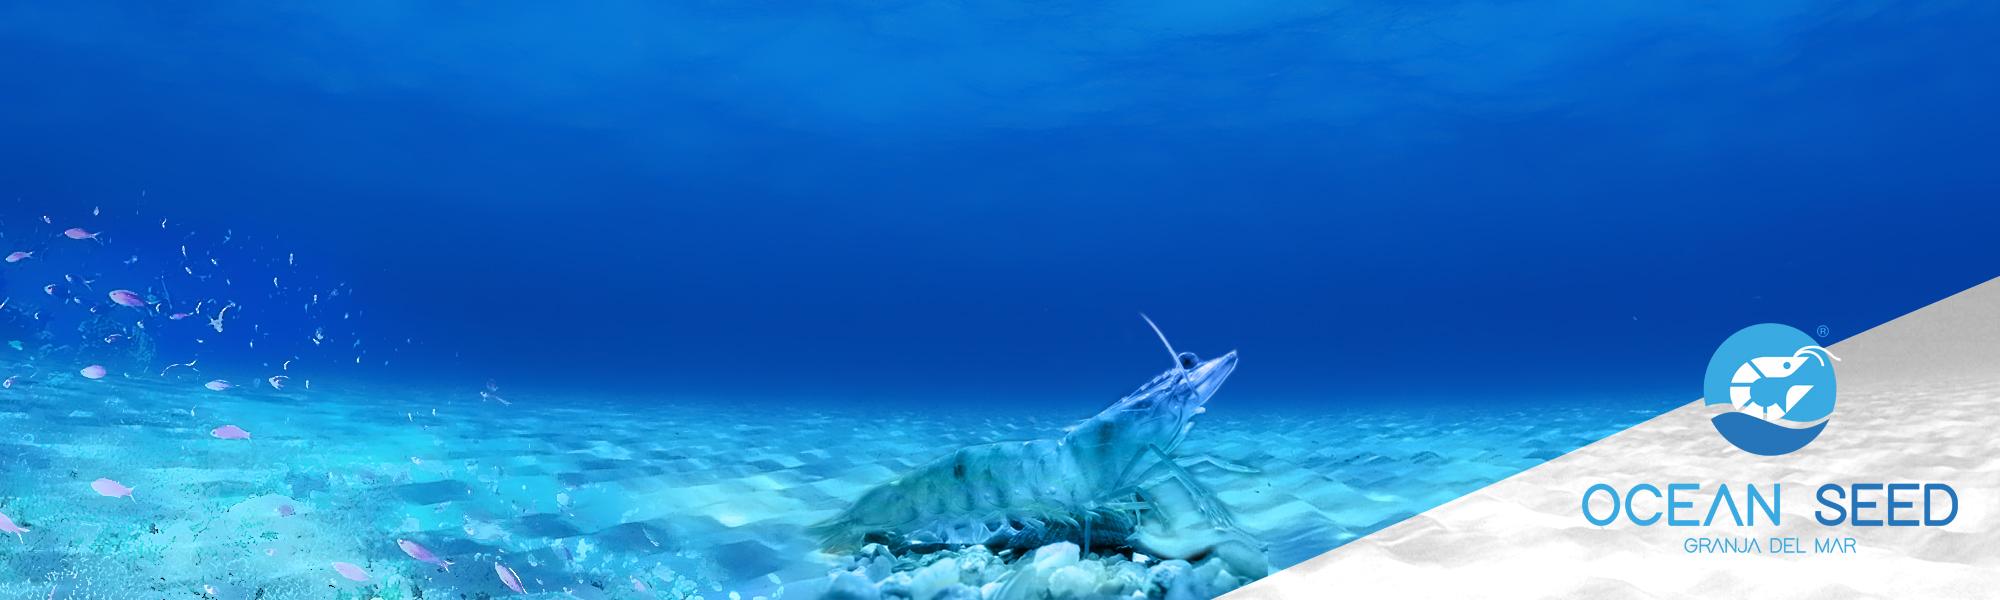 banner_ocean